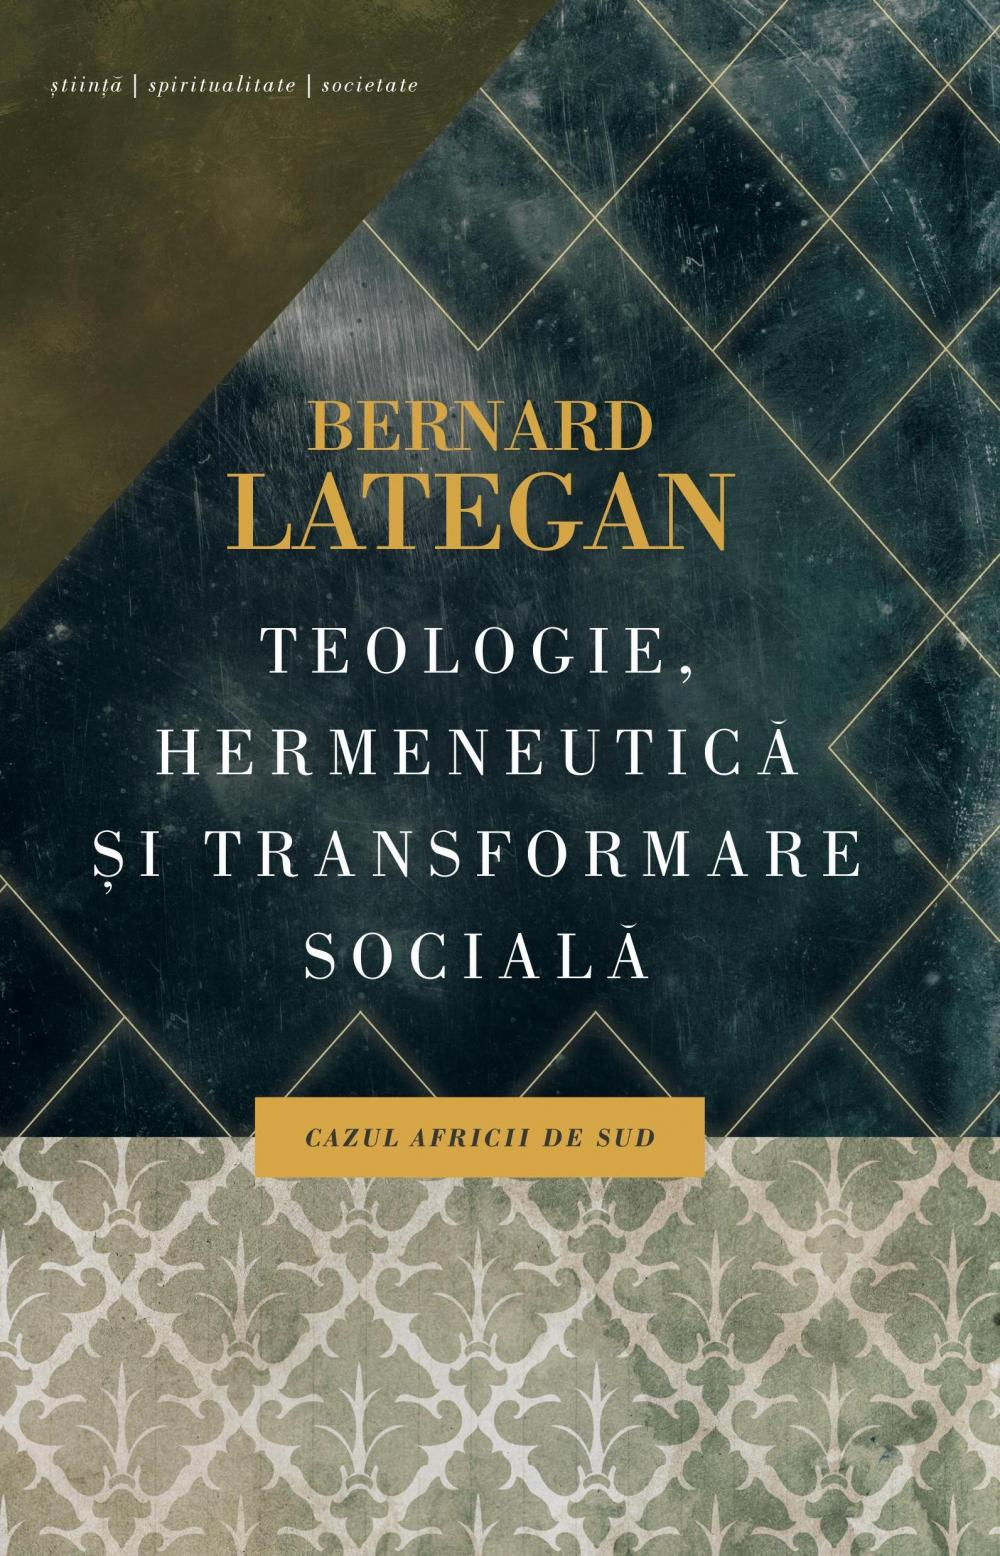 TEOLOGIE, HERMENEUTICA SI TRANSFORMARE SOCIALA